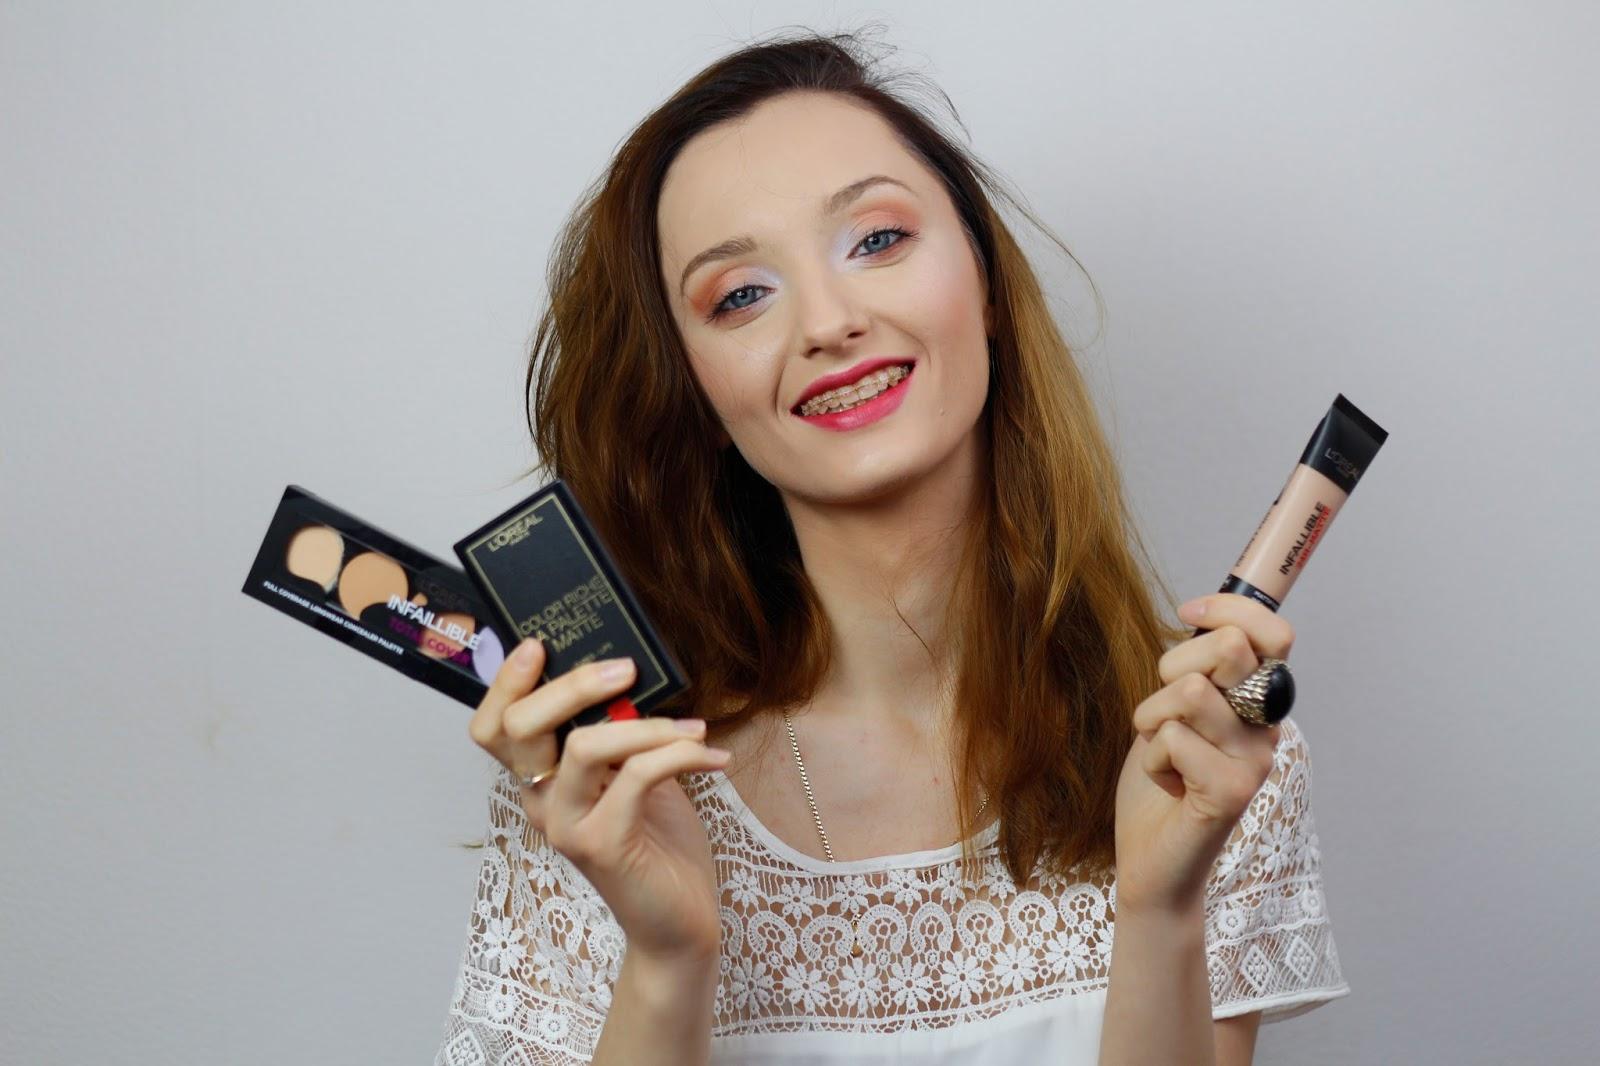 Łatwy makijaż Boho L'oreal